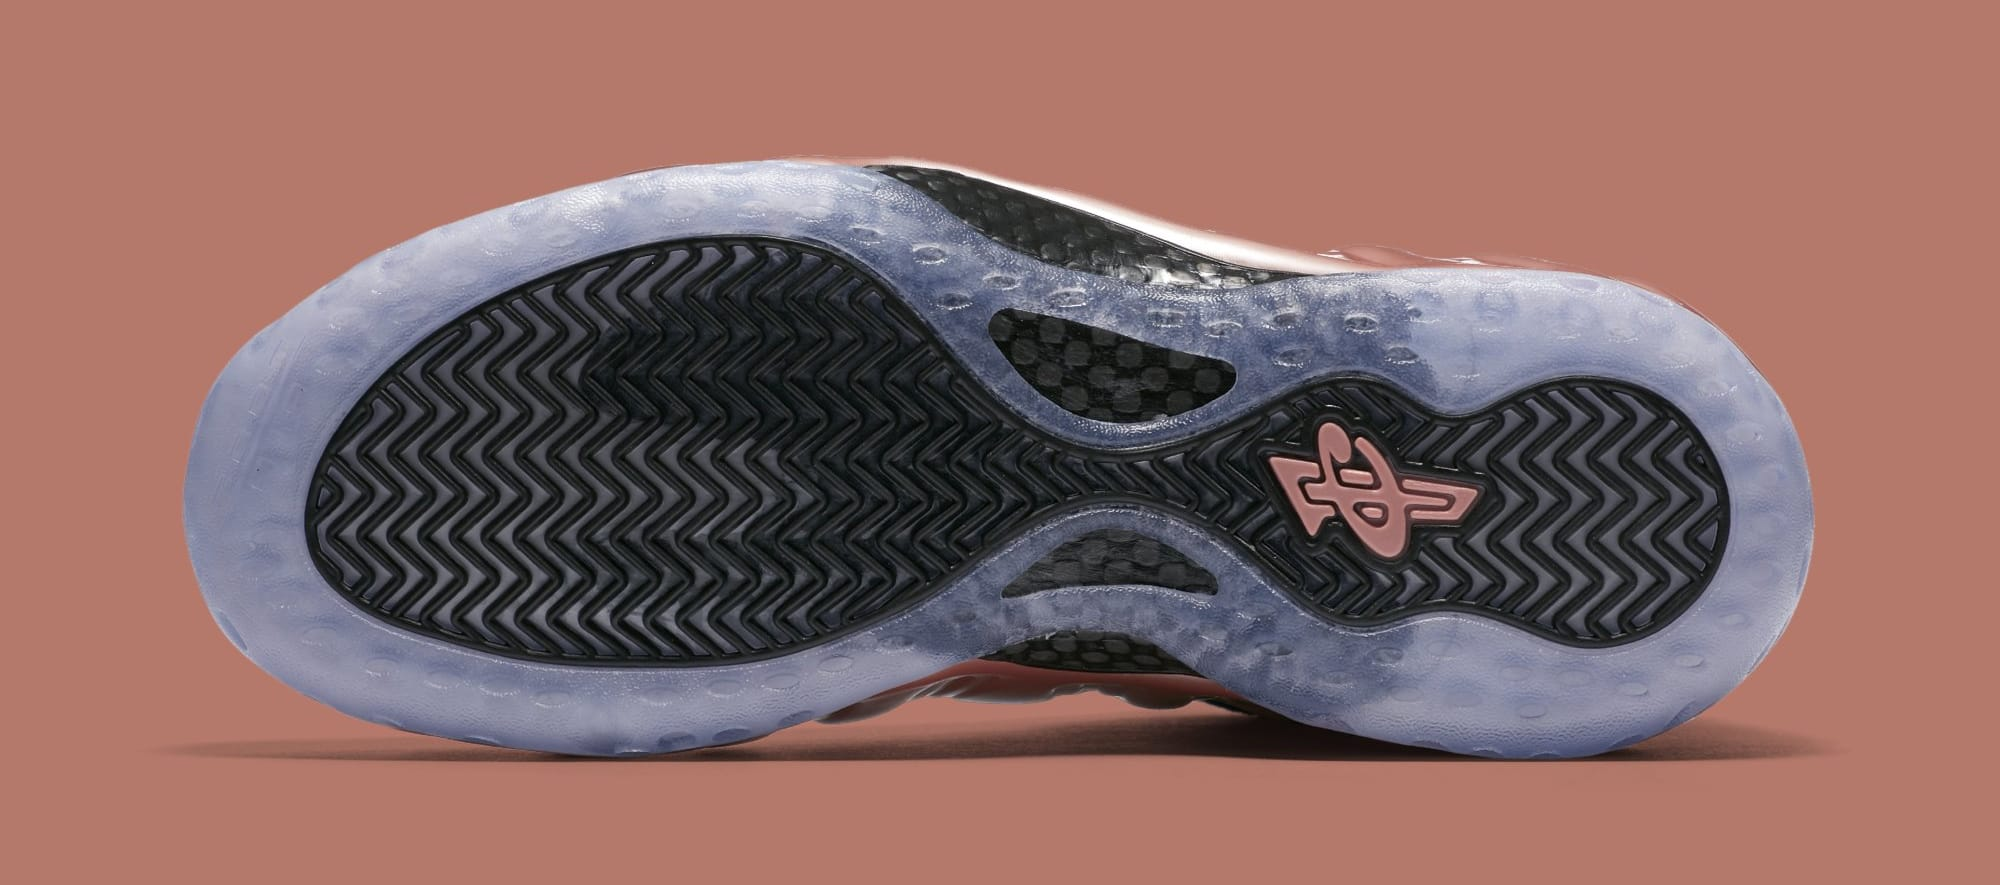 Nike Air Foamposite One 'Elemental Rose' 314996-602 (Bottom)